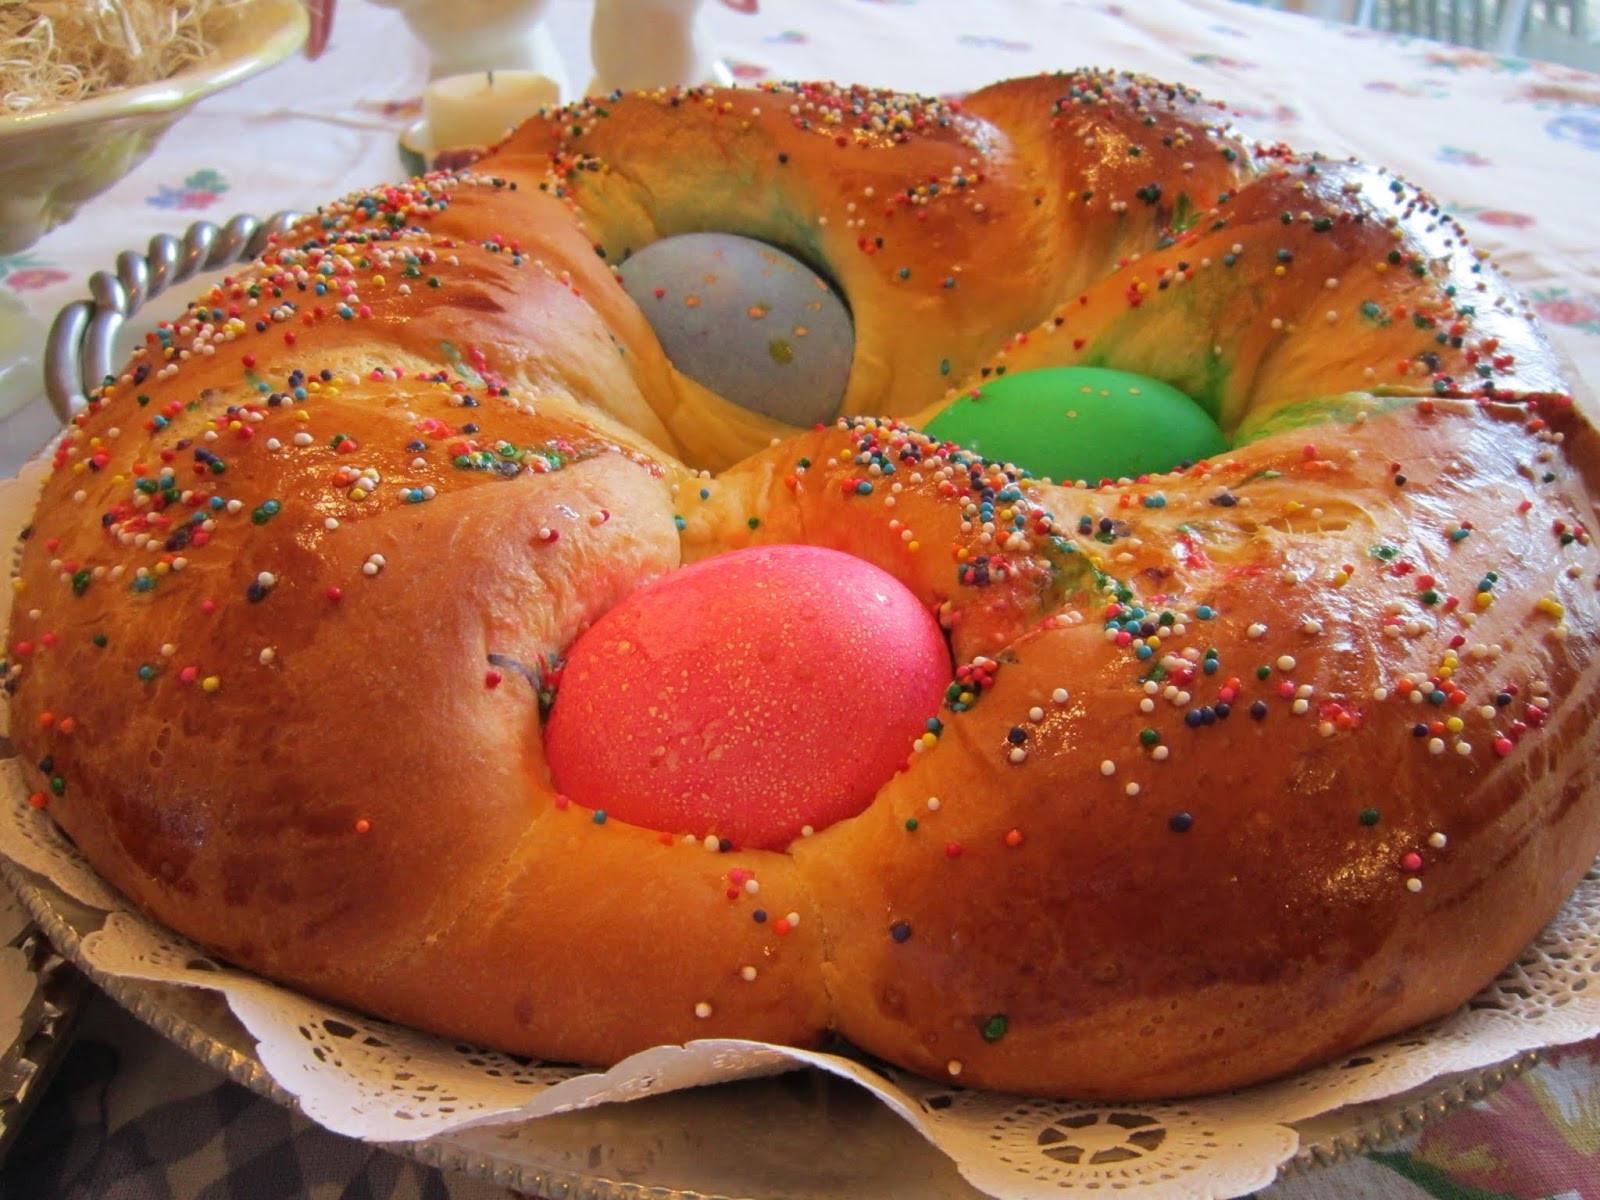 Italian Easter Bread With Meat  The Italian Next Door Easter Sweet Bread